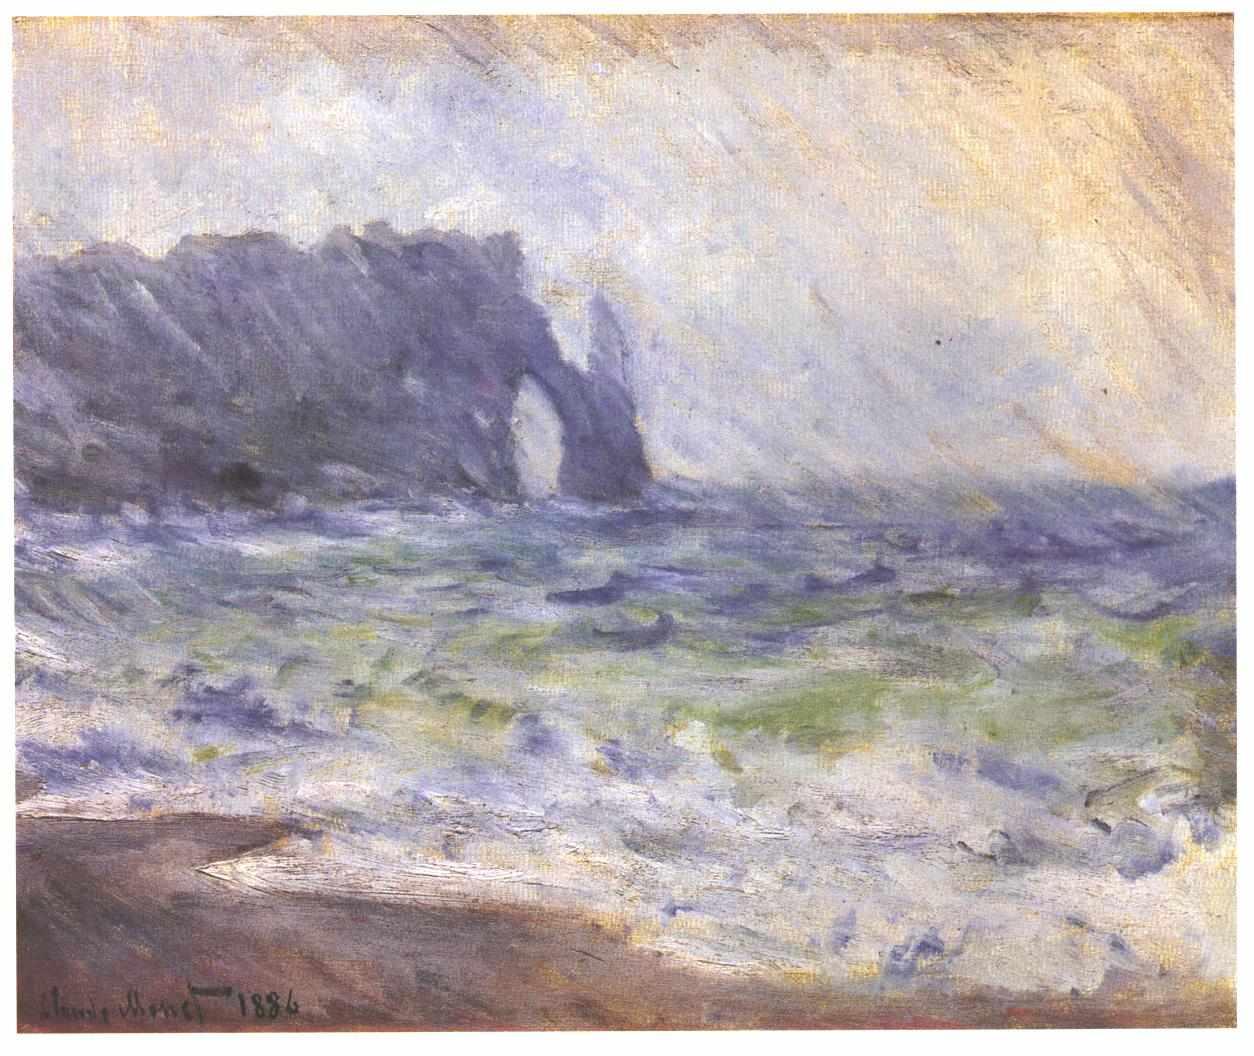 http://upload.wikimedia.org/wikipedia/commons/c/ce/Monet_-_Regen_bei_Eretat.jpg